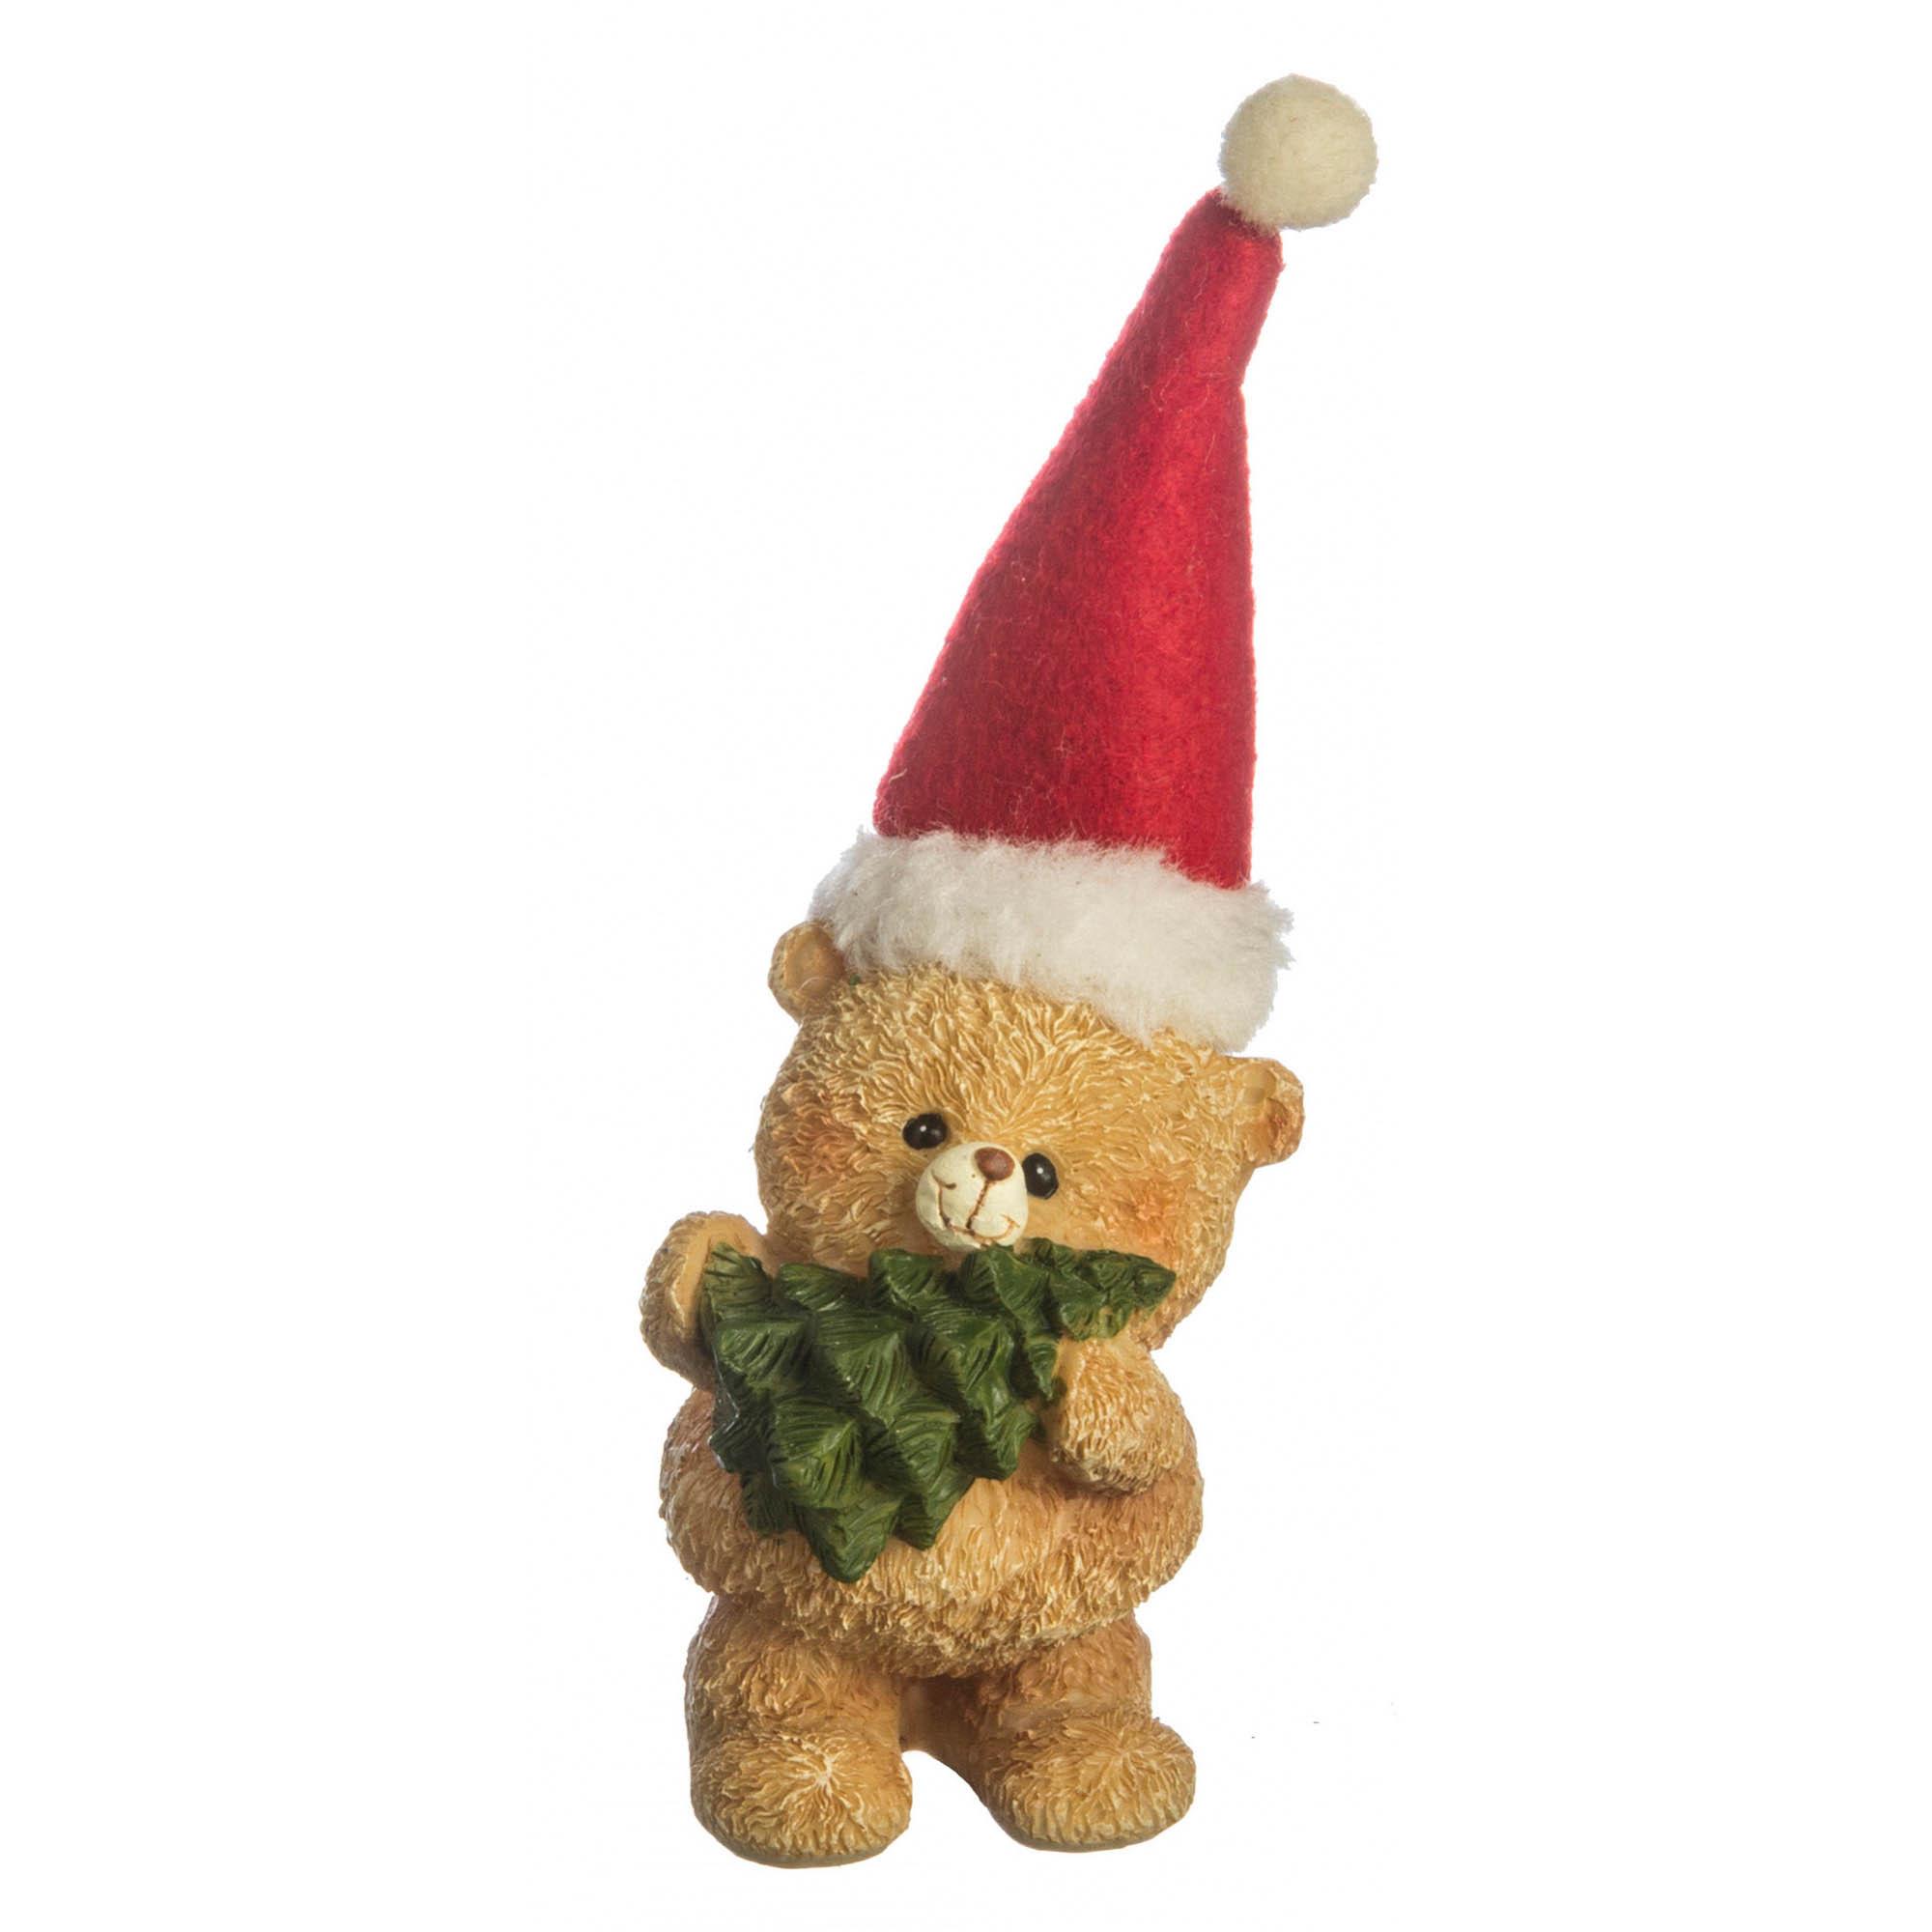 {} Lefard Интерьерная игрушка Медвежонок (5х6х7 см) lefard интерьерная игрушка jan 5х6х13 см